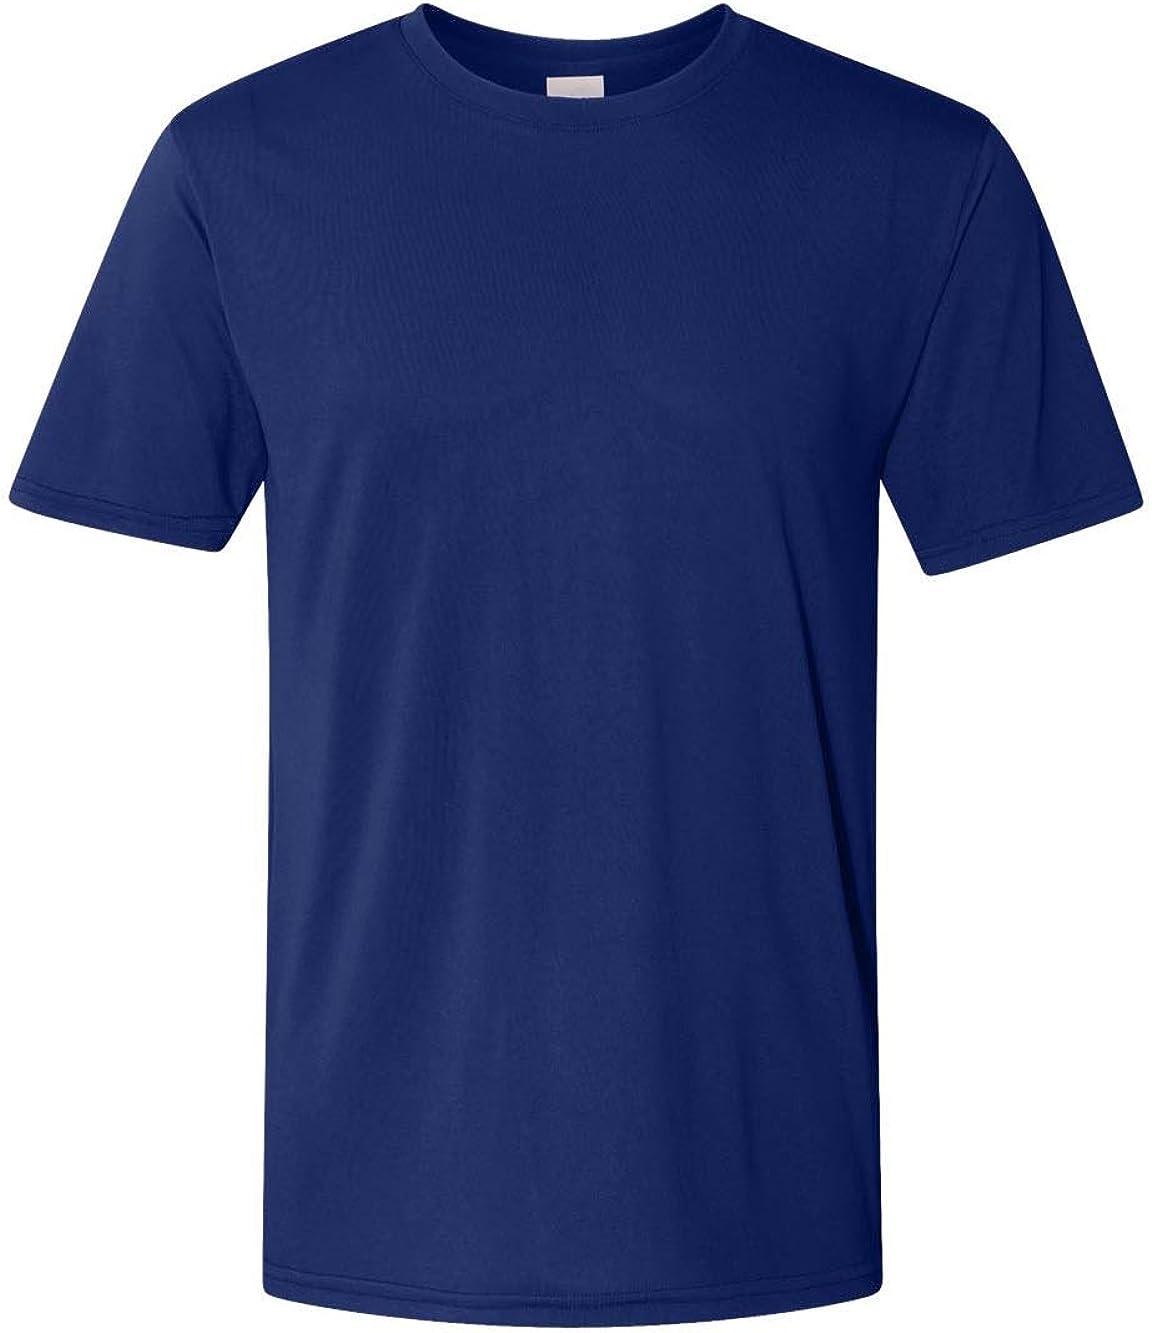 Gildan Adult Performance 47 Oz Core T-Shirt - White - S - (Style # G460 - Original Label)